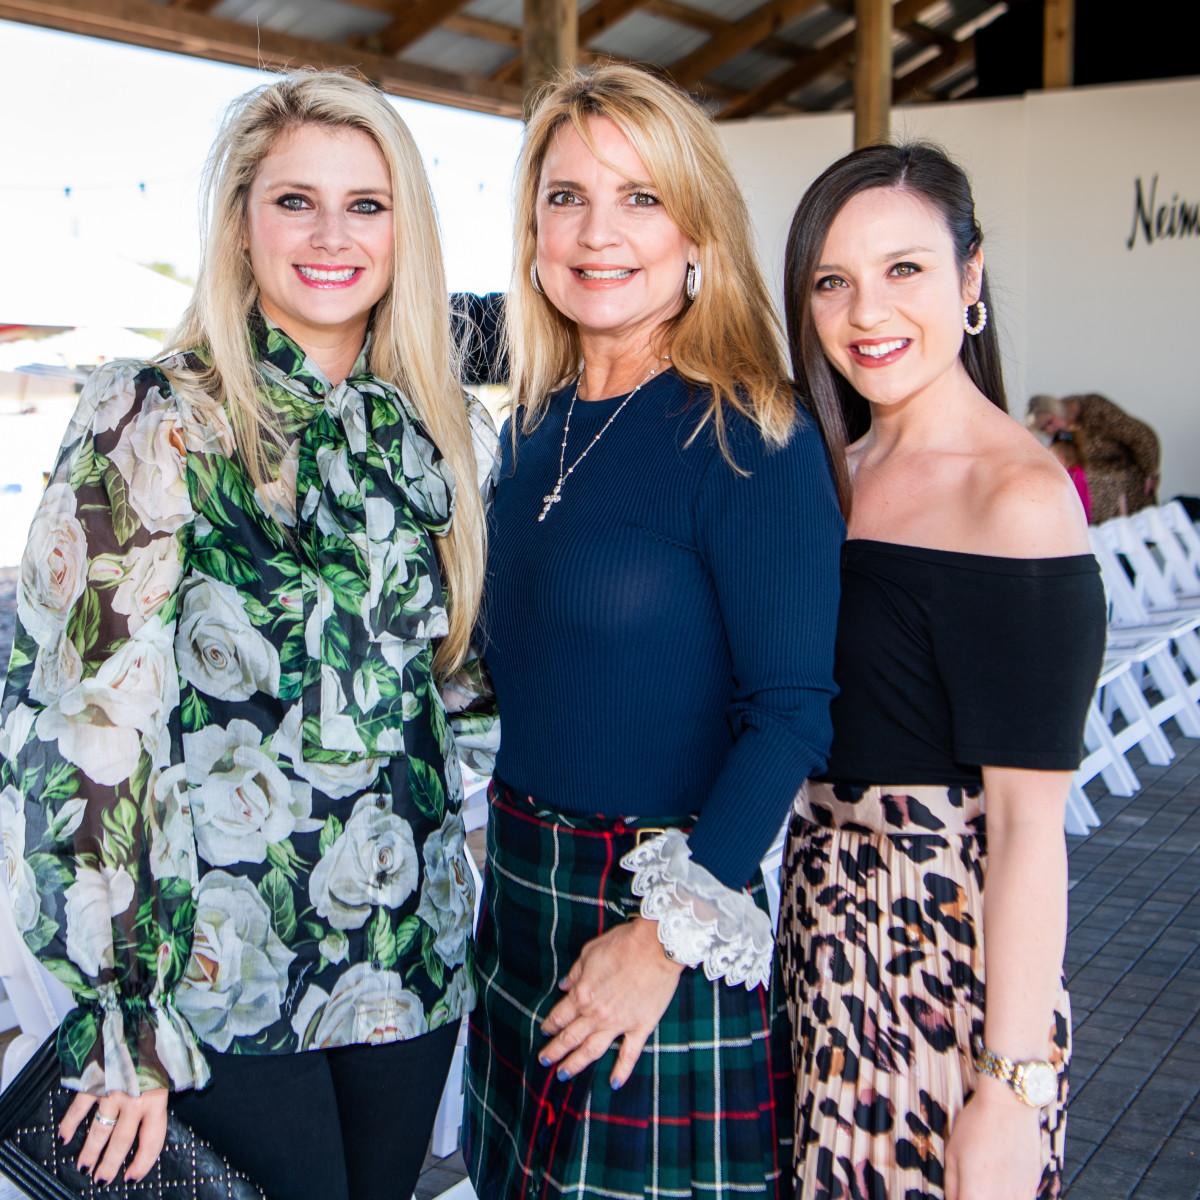 Fashion in the Fields 2019  Christine Falgout-Gutknecht, Melissa Juneau, Jordan Holman_0077_RFSFashionInTheField_111019_MCW.jpg